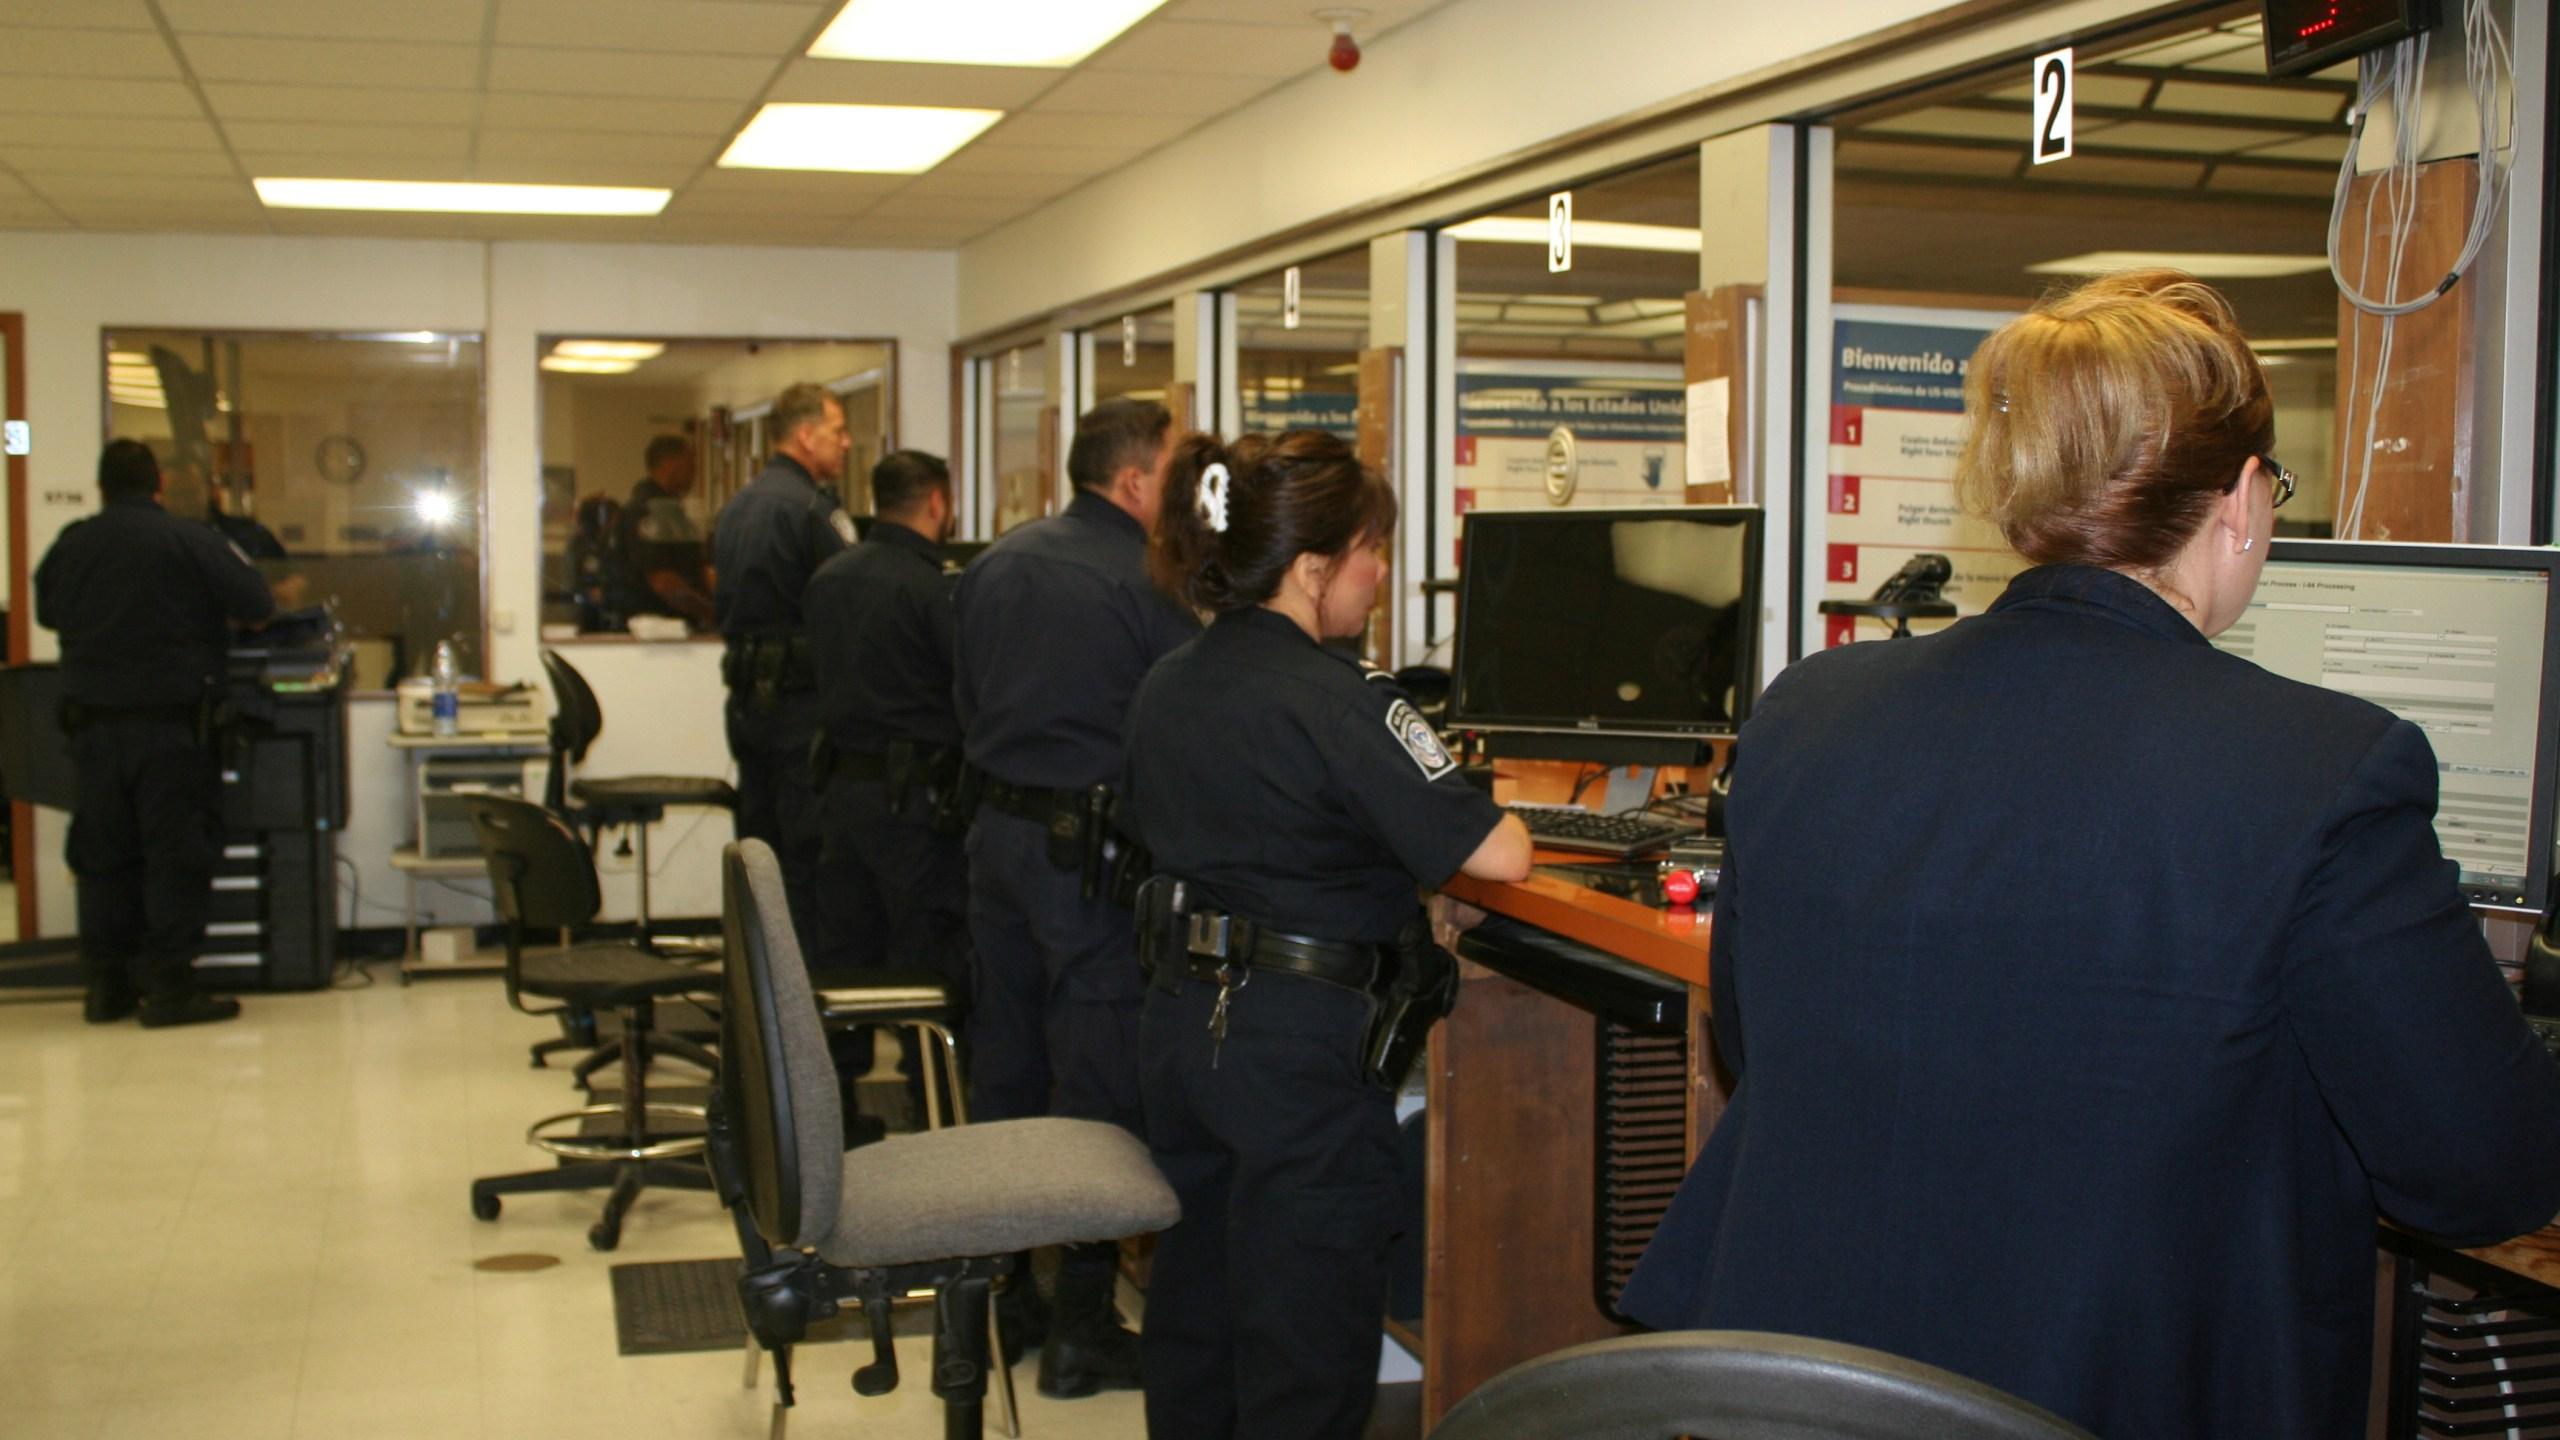 CBPOs PPC, courtesy CBP Hidalgo_1535170776251.JPG.jpg